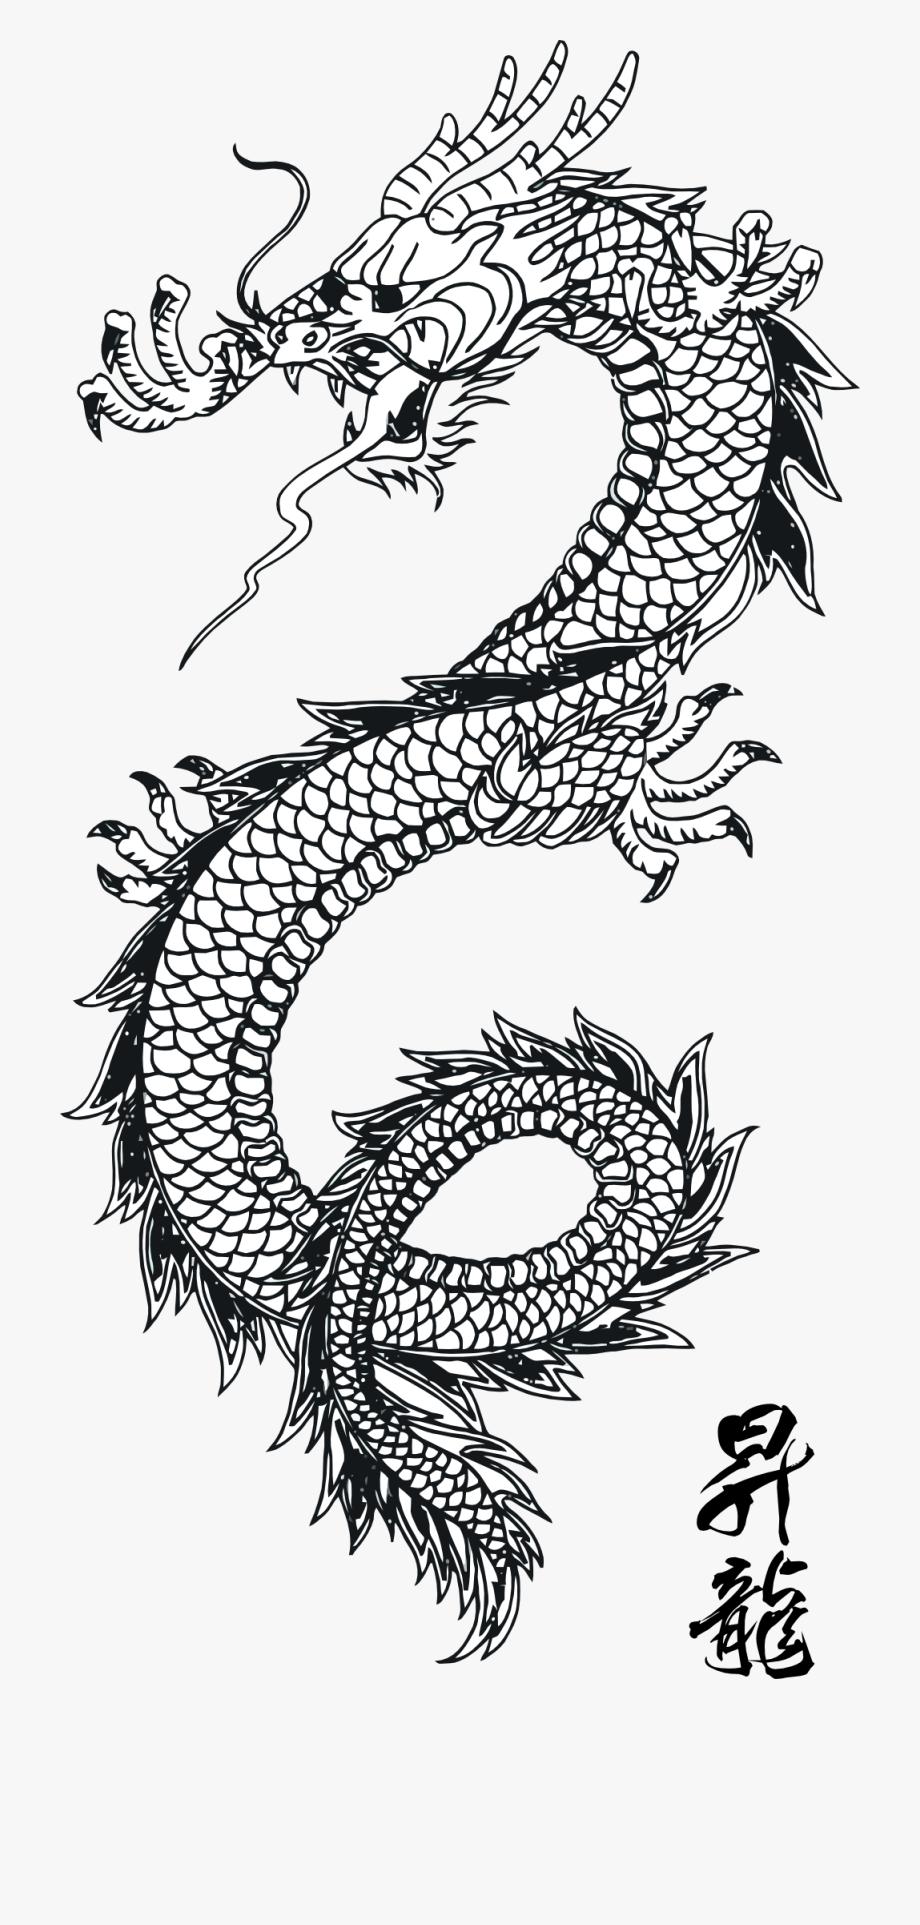 Chinesischer Drache Tattoo Png Chinesischer Drache Tattoo Png Chinesedragontattoo Chinesis Dragon Tattoo Arm Chinese Dragon Tattoos Asian Dragon Tattoo